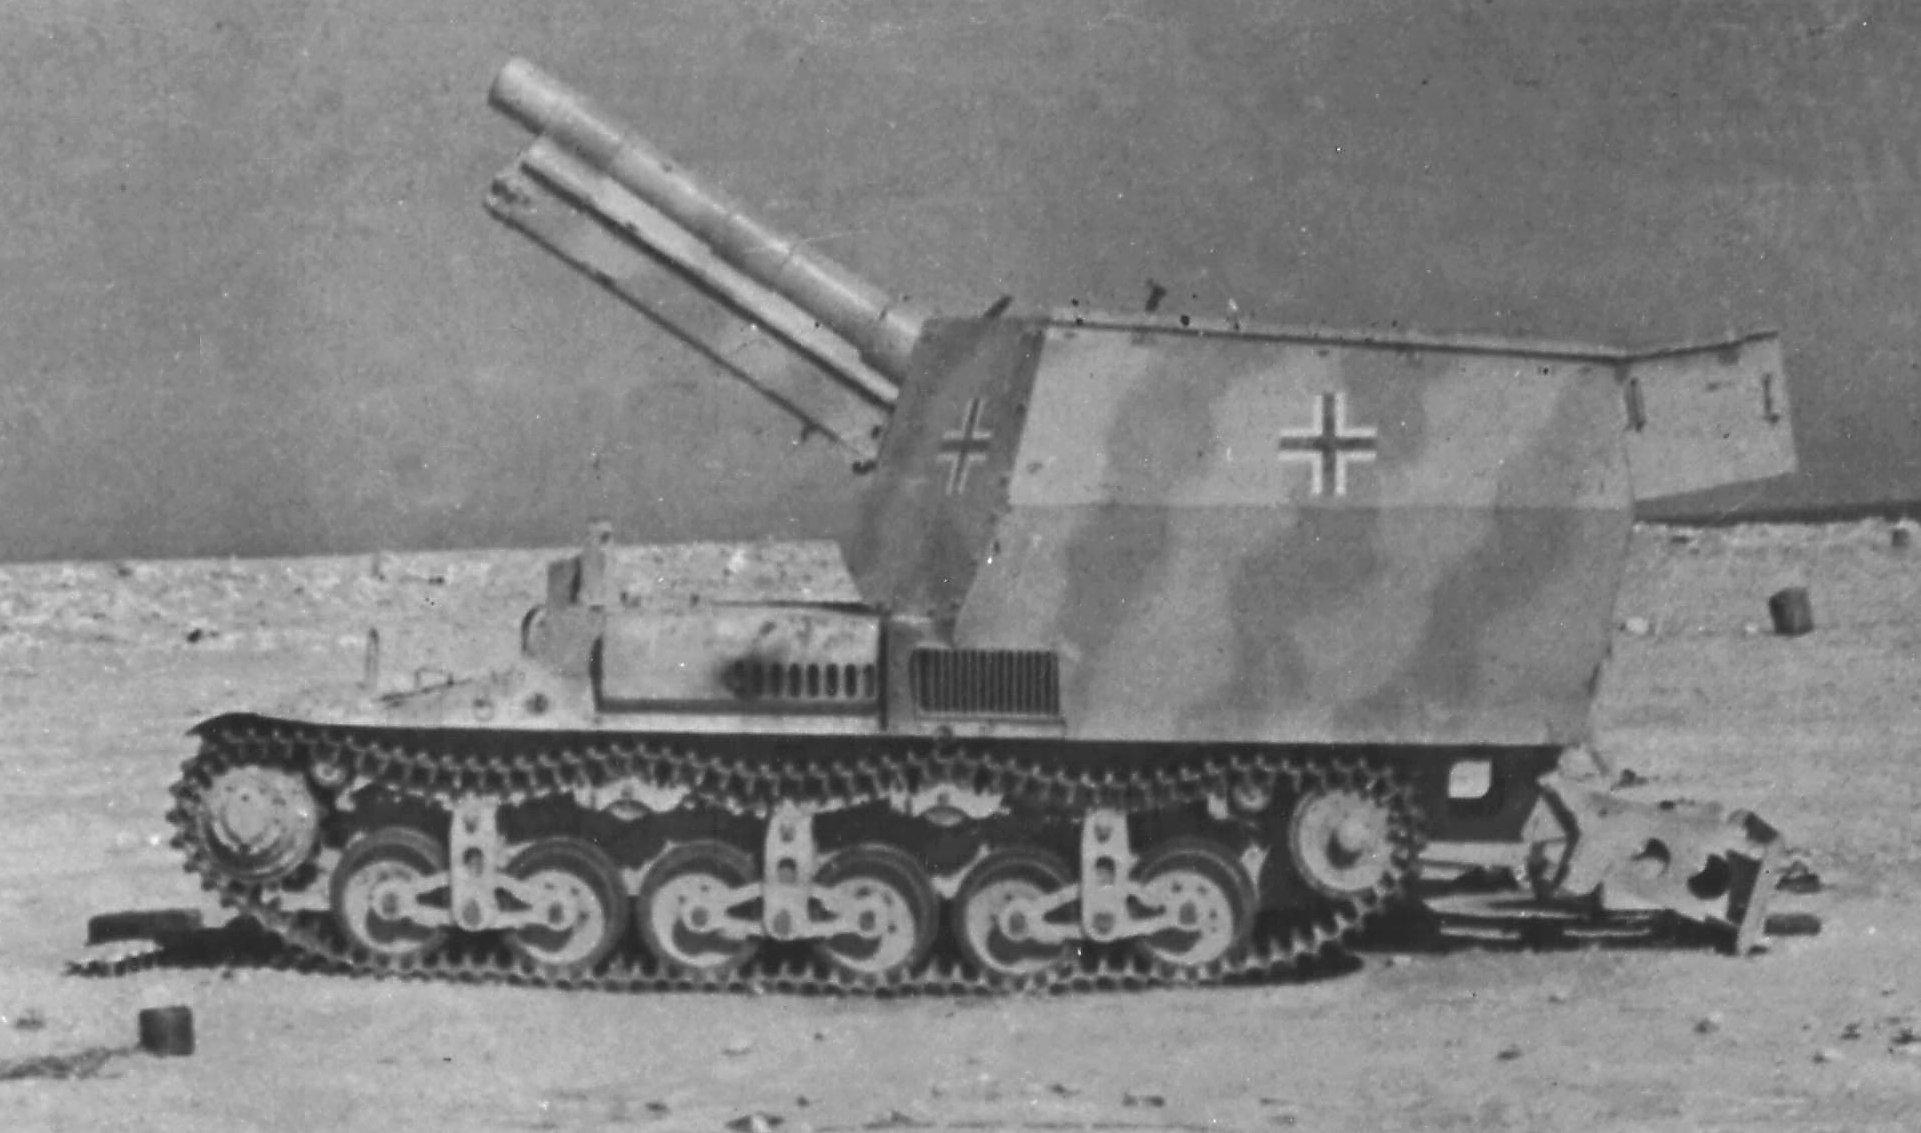 One of the twenty three15cm sFH 13 auf Lorraine Schlepper self-propelled artillery guns used in North Africa.